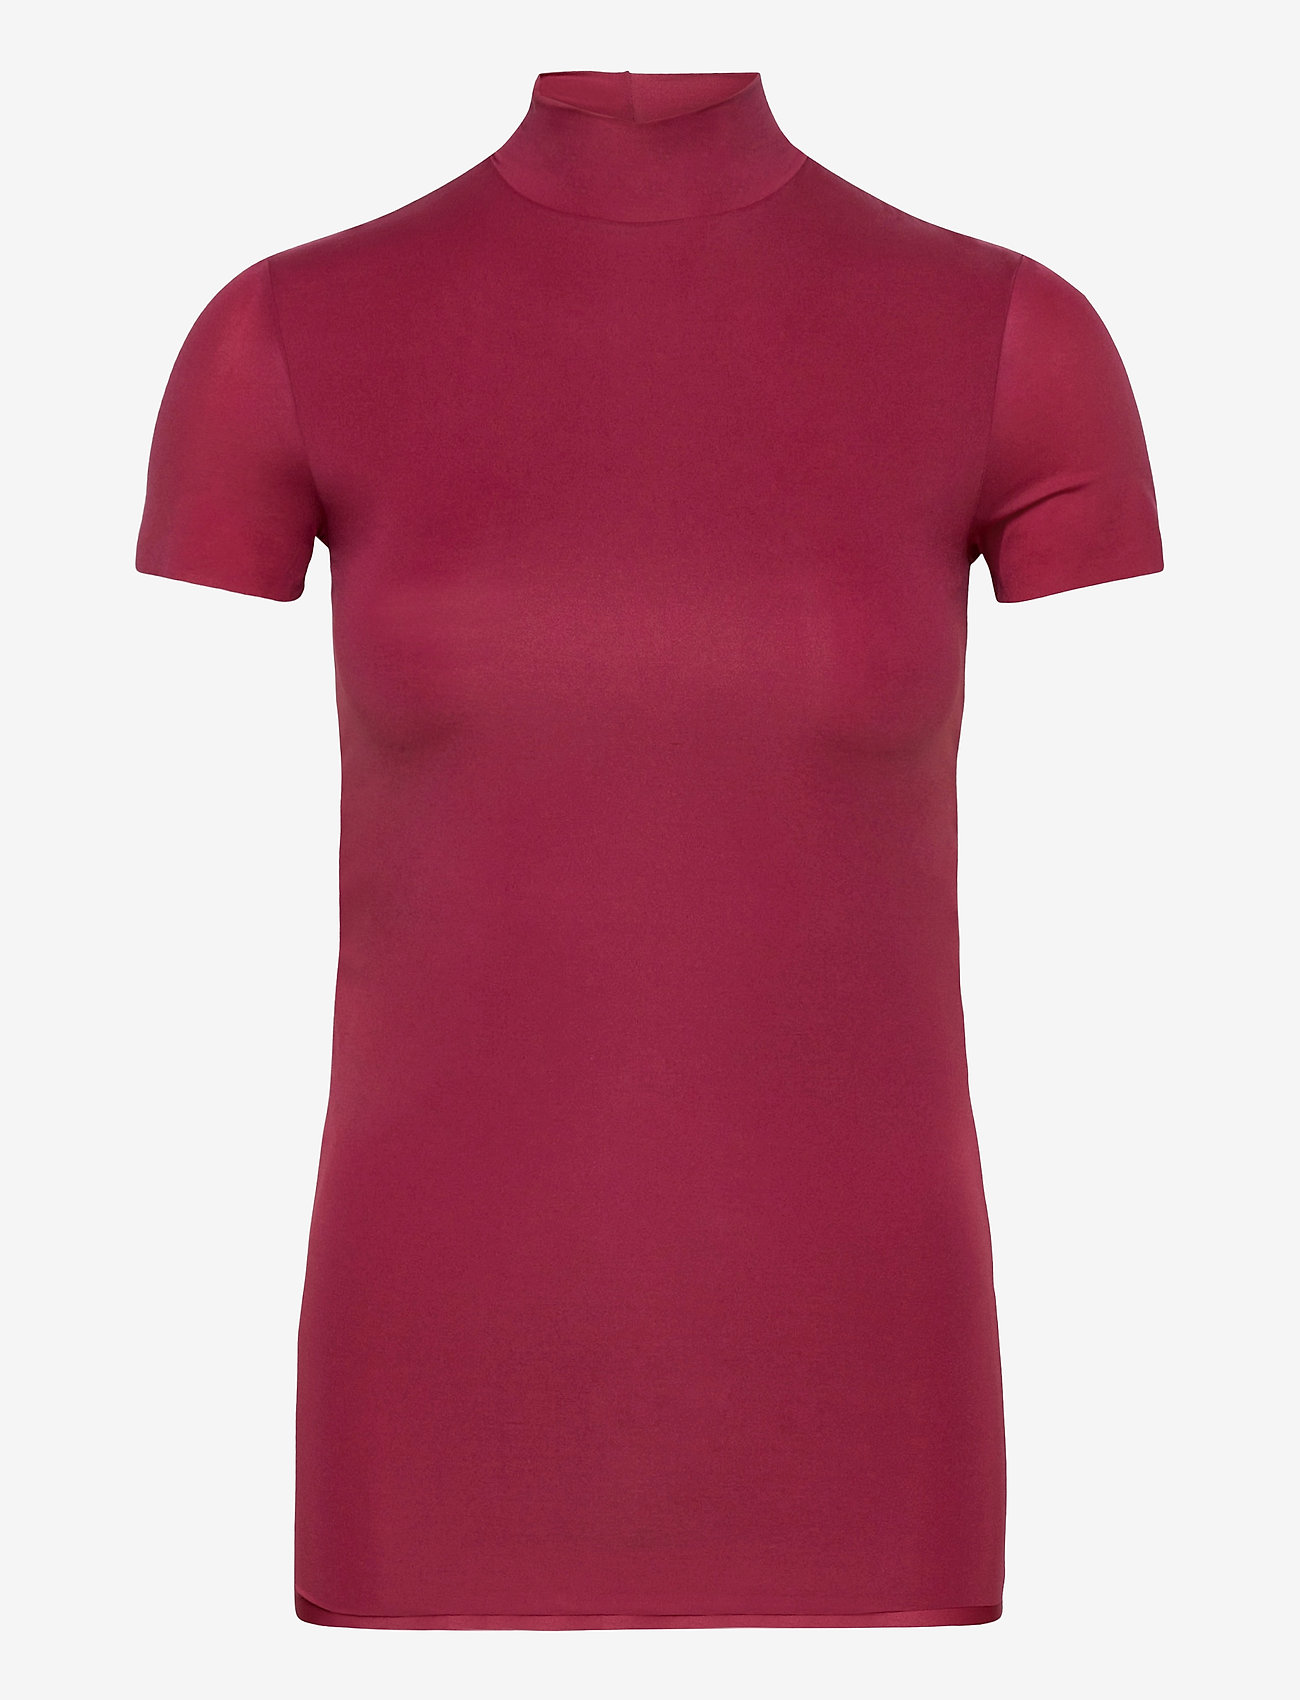 Max&Co. - CRUNA - t-shirts - burgundy - 0